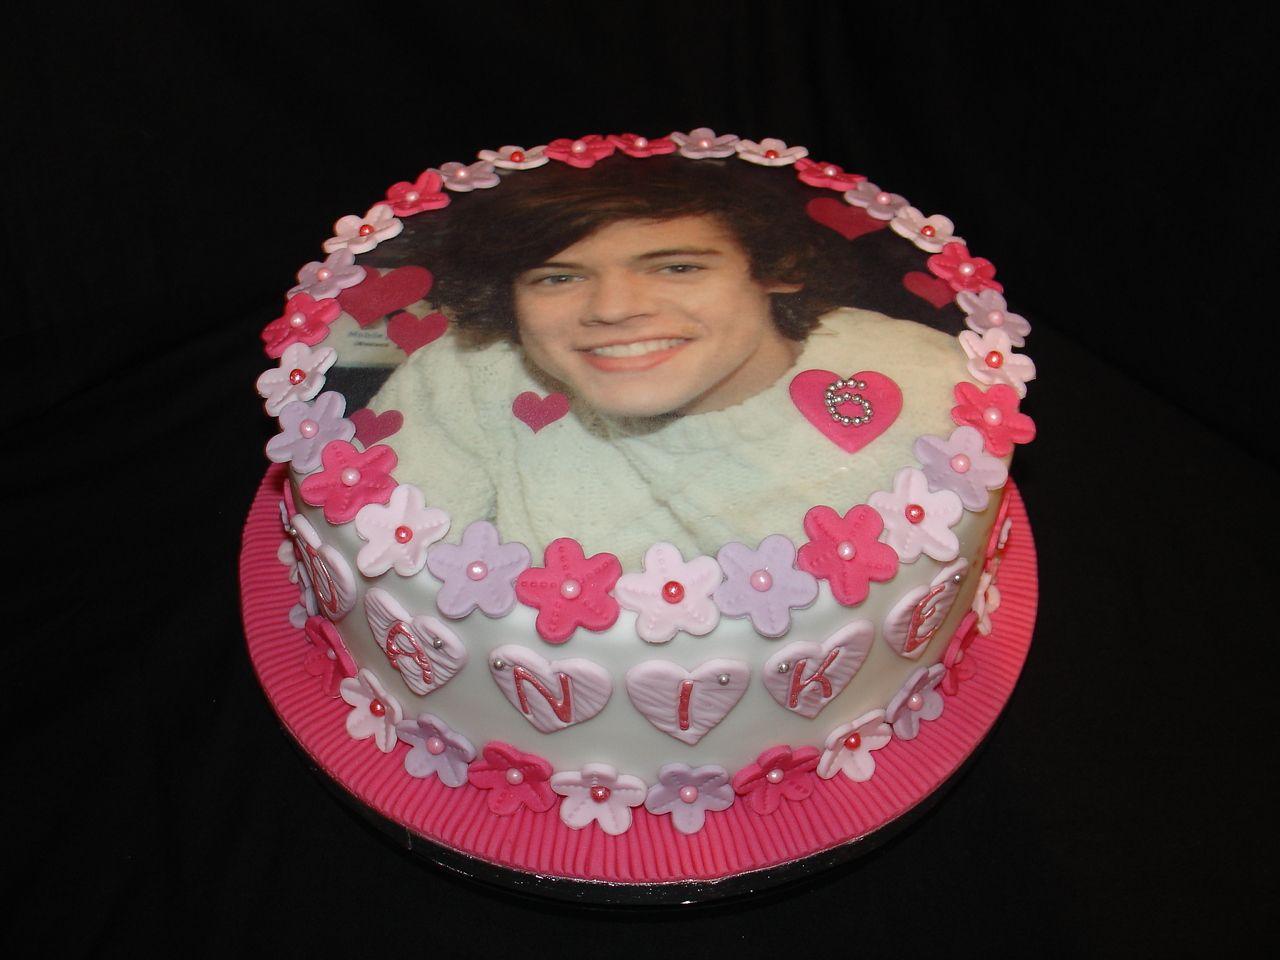 One Direction Harry Styles Fondant Cake Jan 2013 Harry